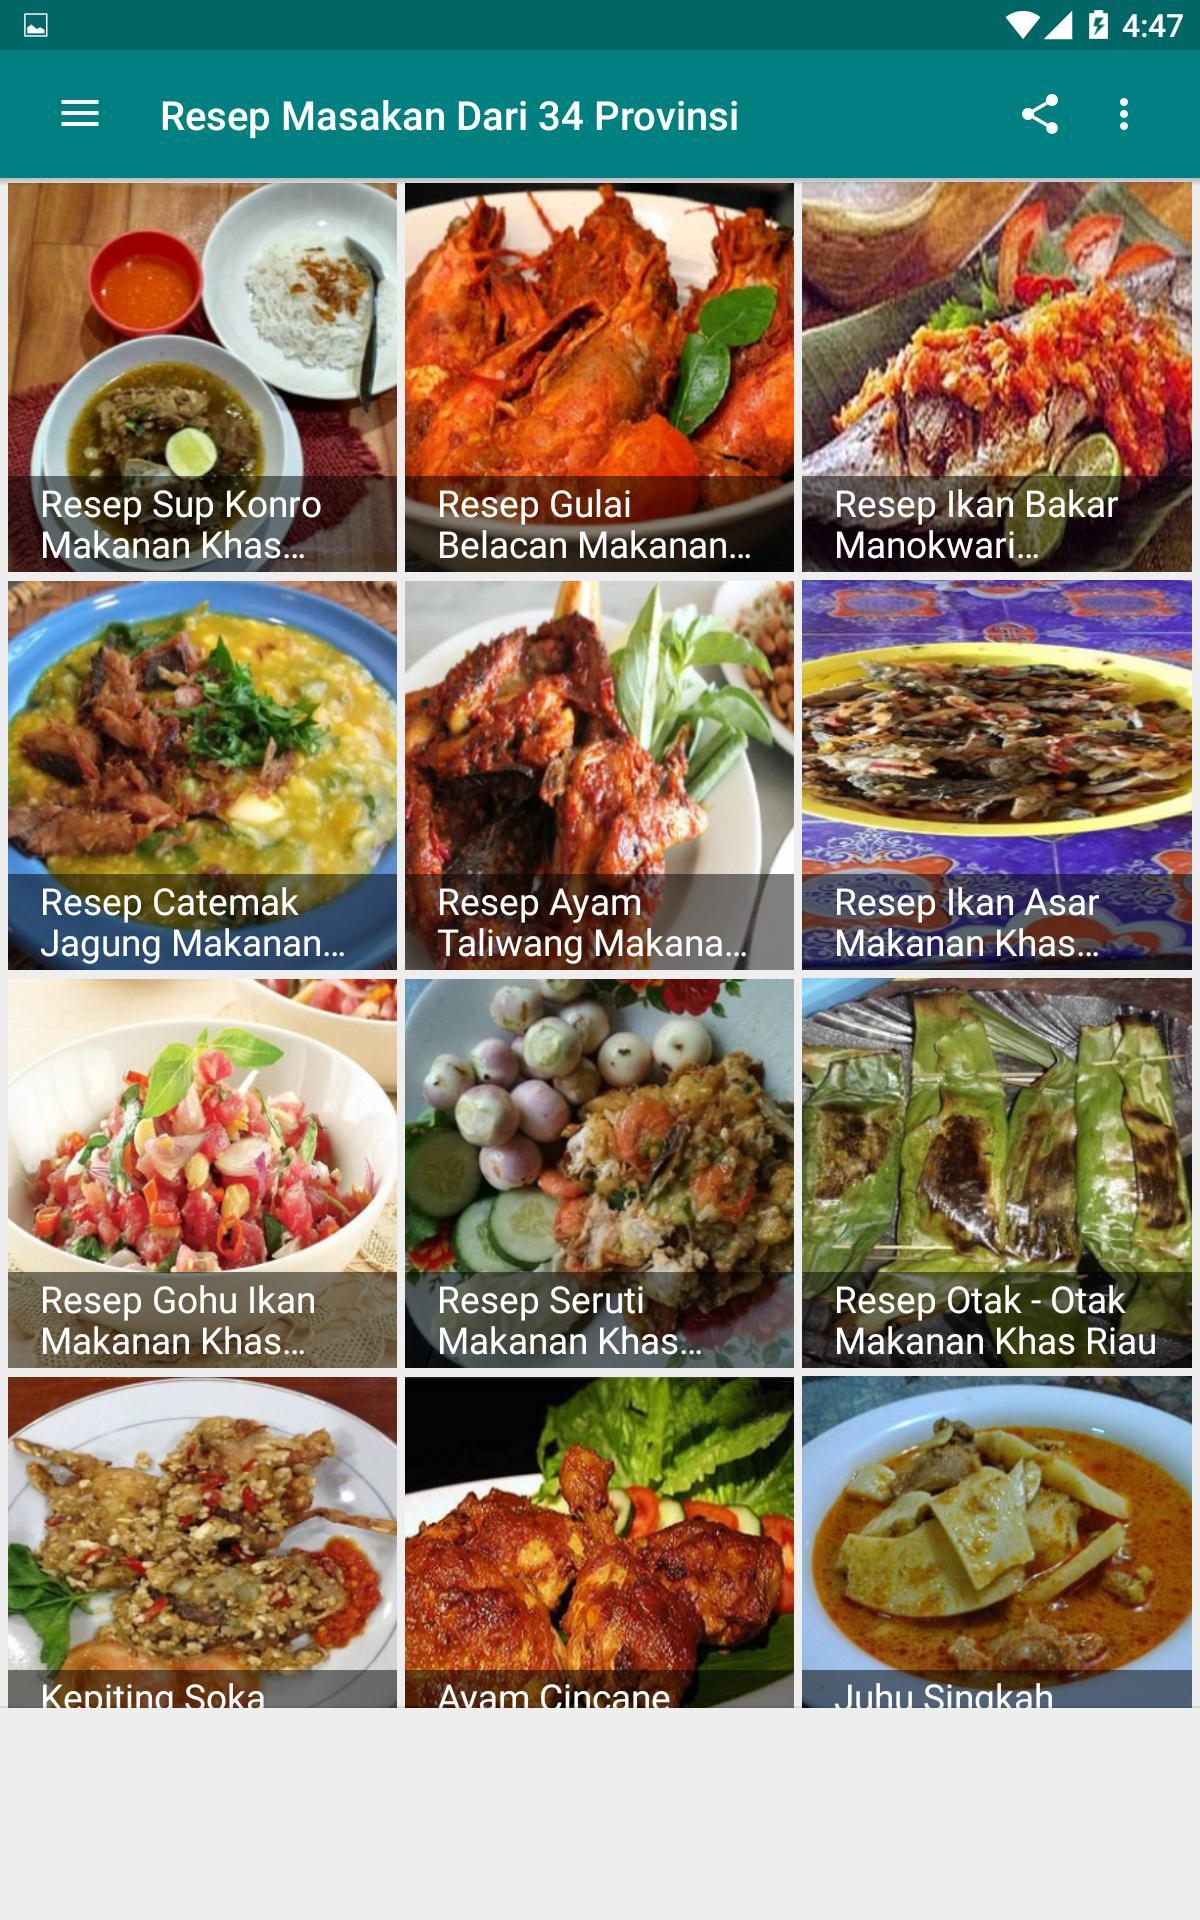 Gambar Makanan Khas Daerah 34 Provinsi Di Indonesia - Info Terkait Gambar